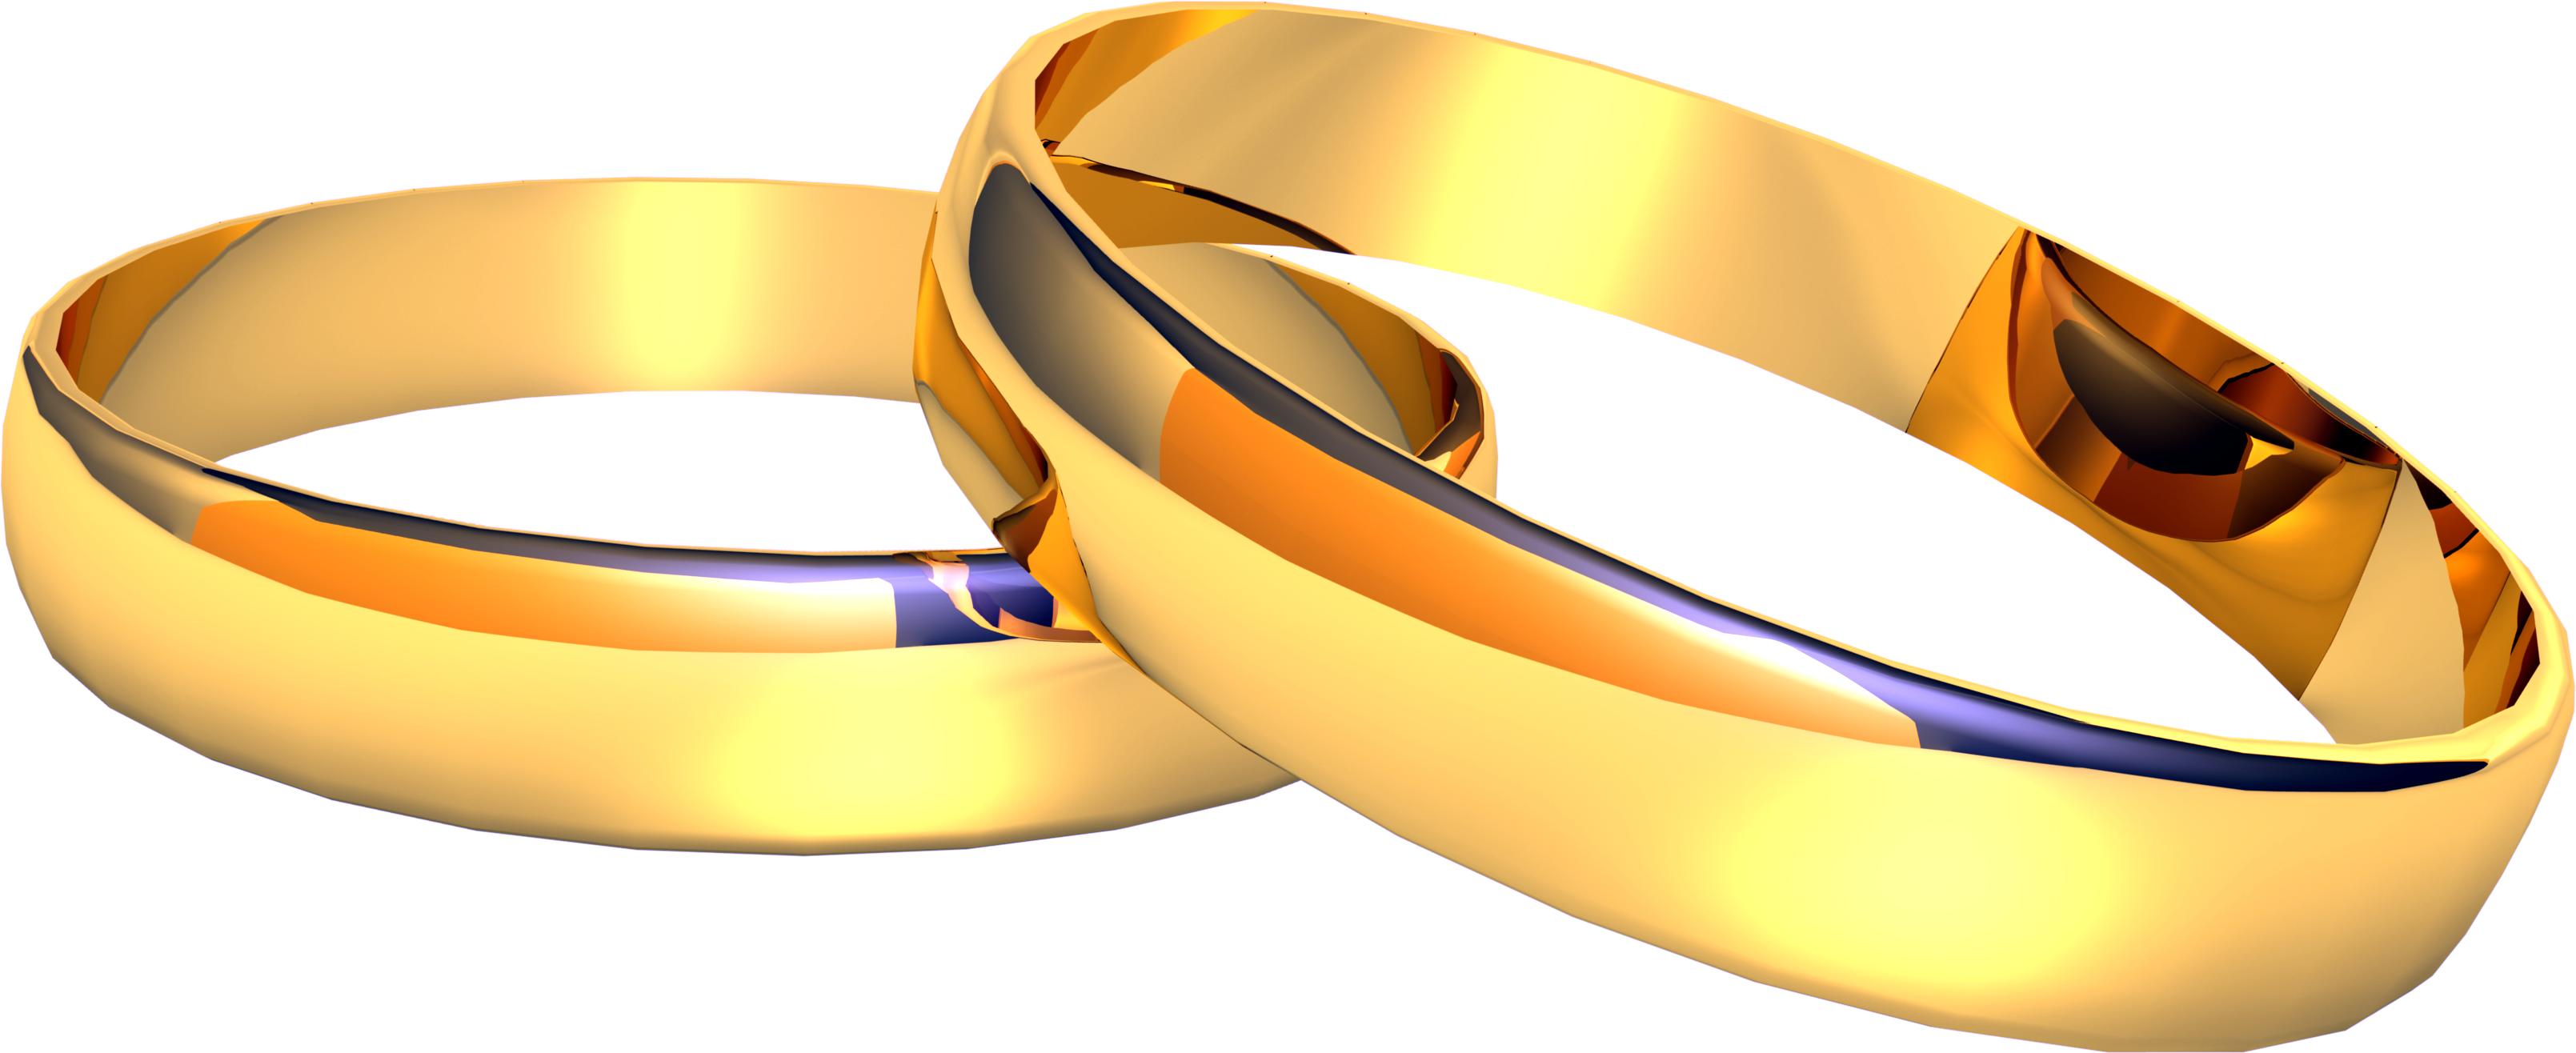 Wedding Png Image PNG Image - Wedding PNG Download